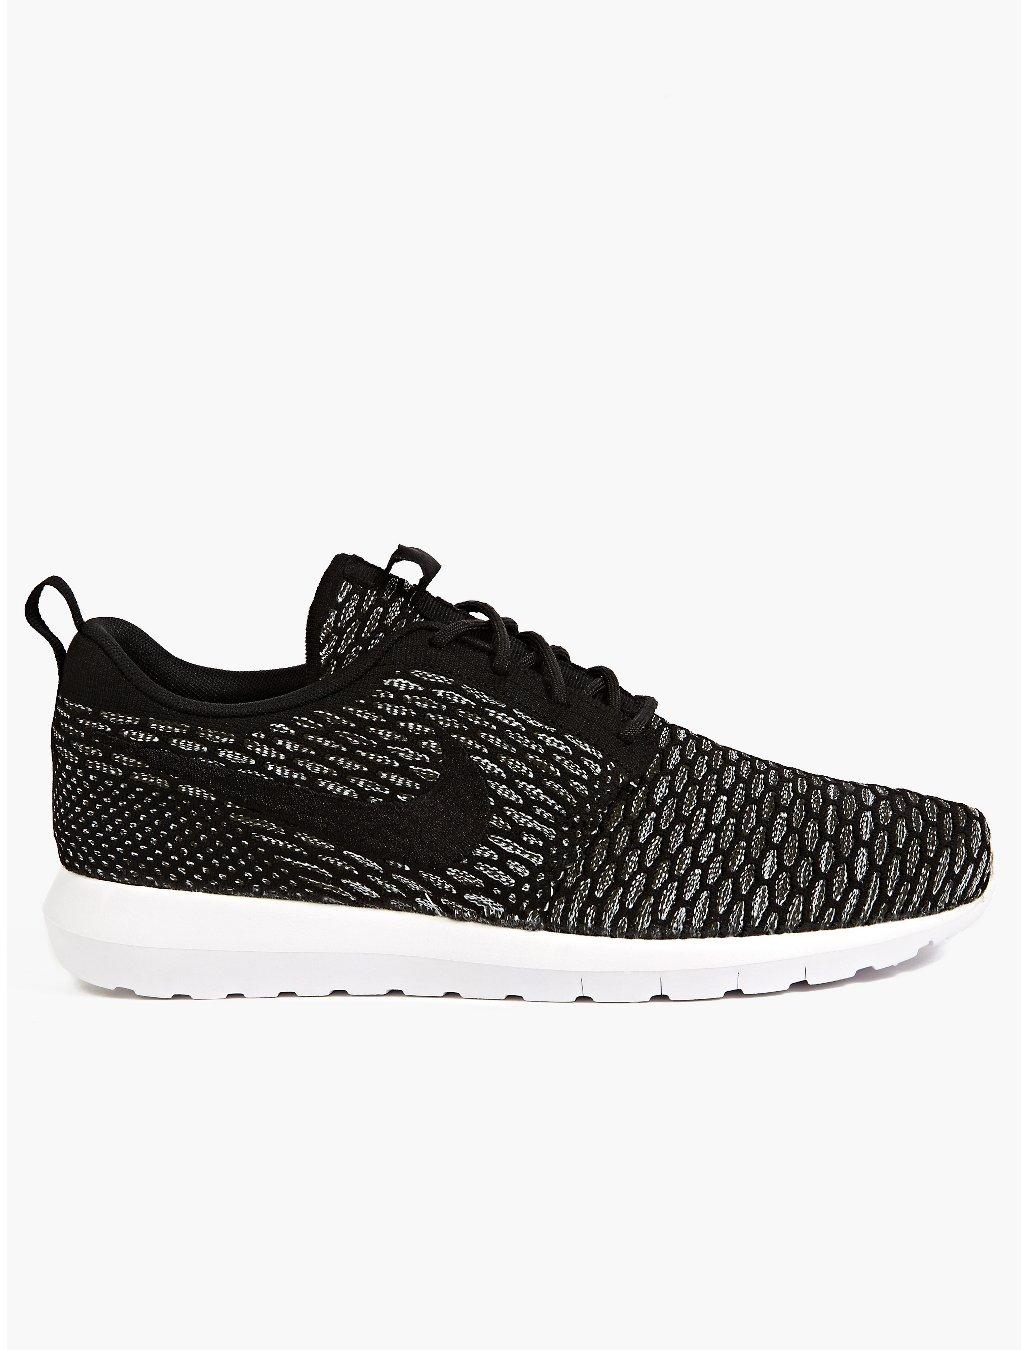 Nike Mens Black Flyknit Roshe Run Sneakers in Black for ...